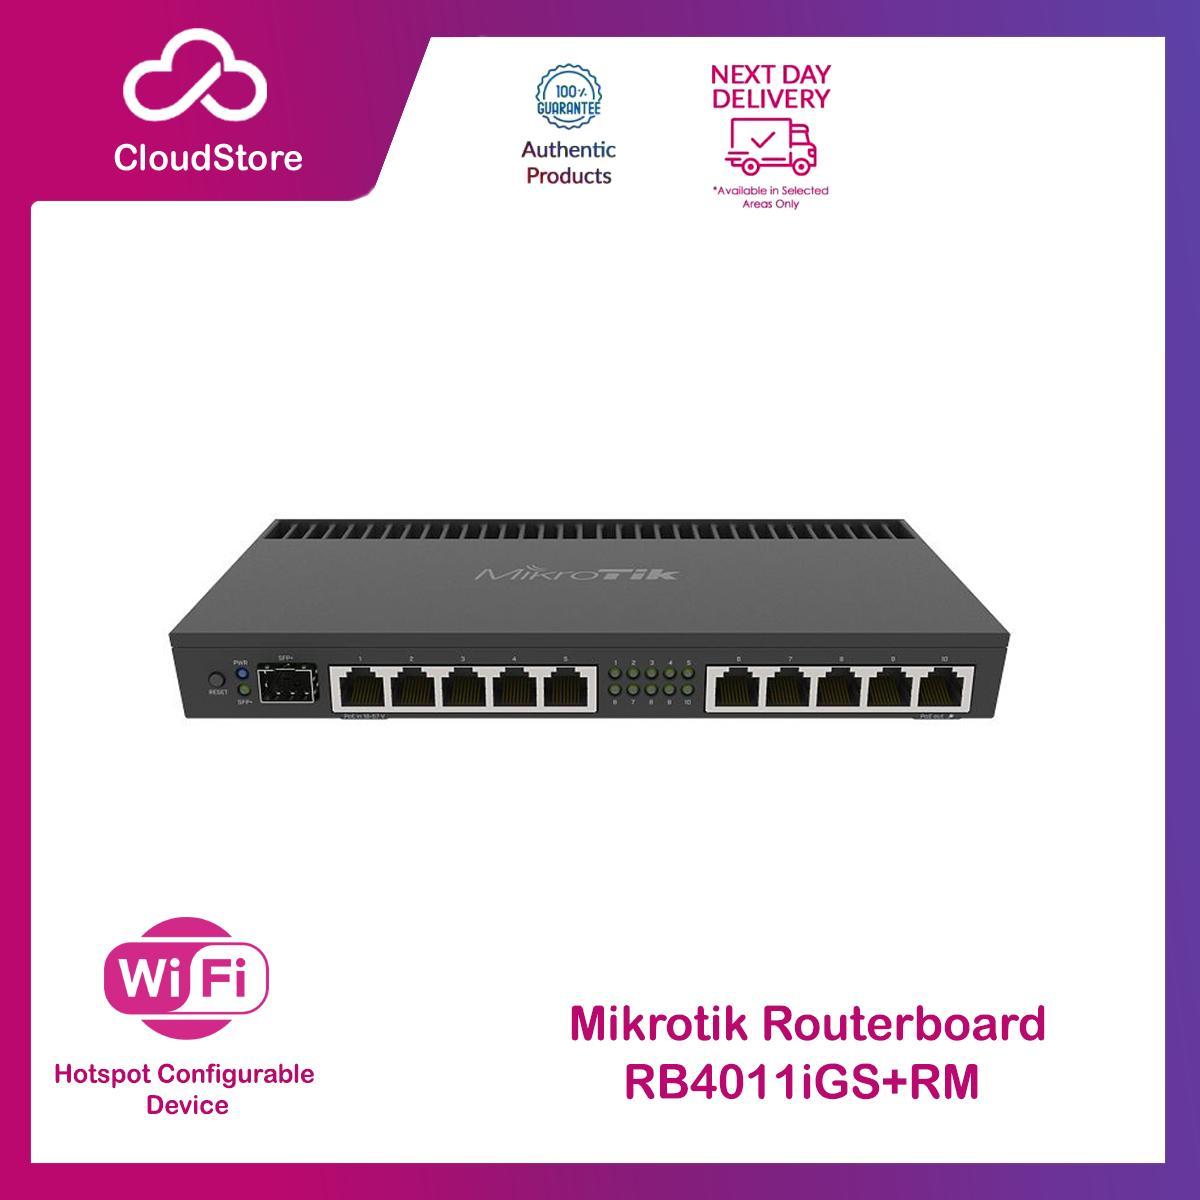 Mikrotik RB4011 10-Port Gigabit SFP+ 10Gbps Quad-core 1 4Ghz CPU, 1GB RAM  Management Rackmount Router - RB4011iGS+RM